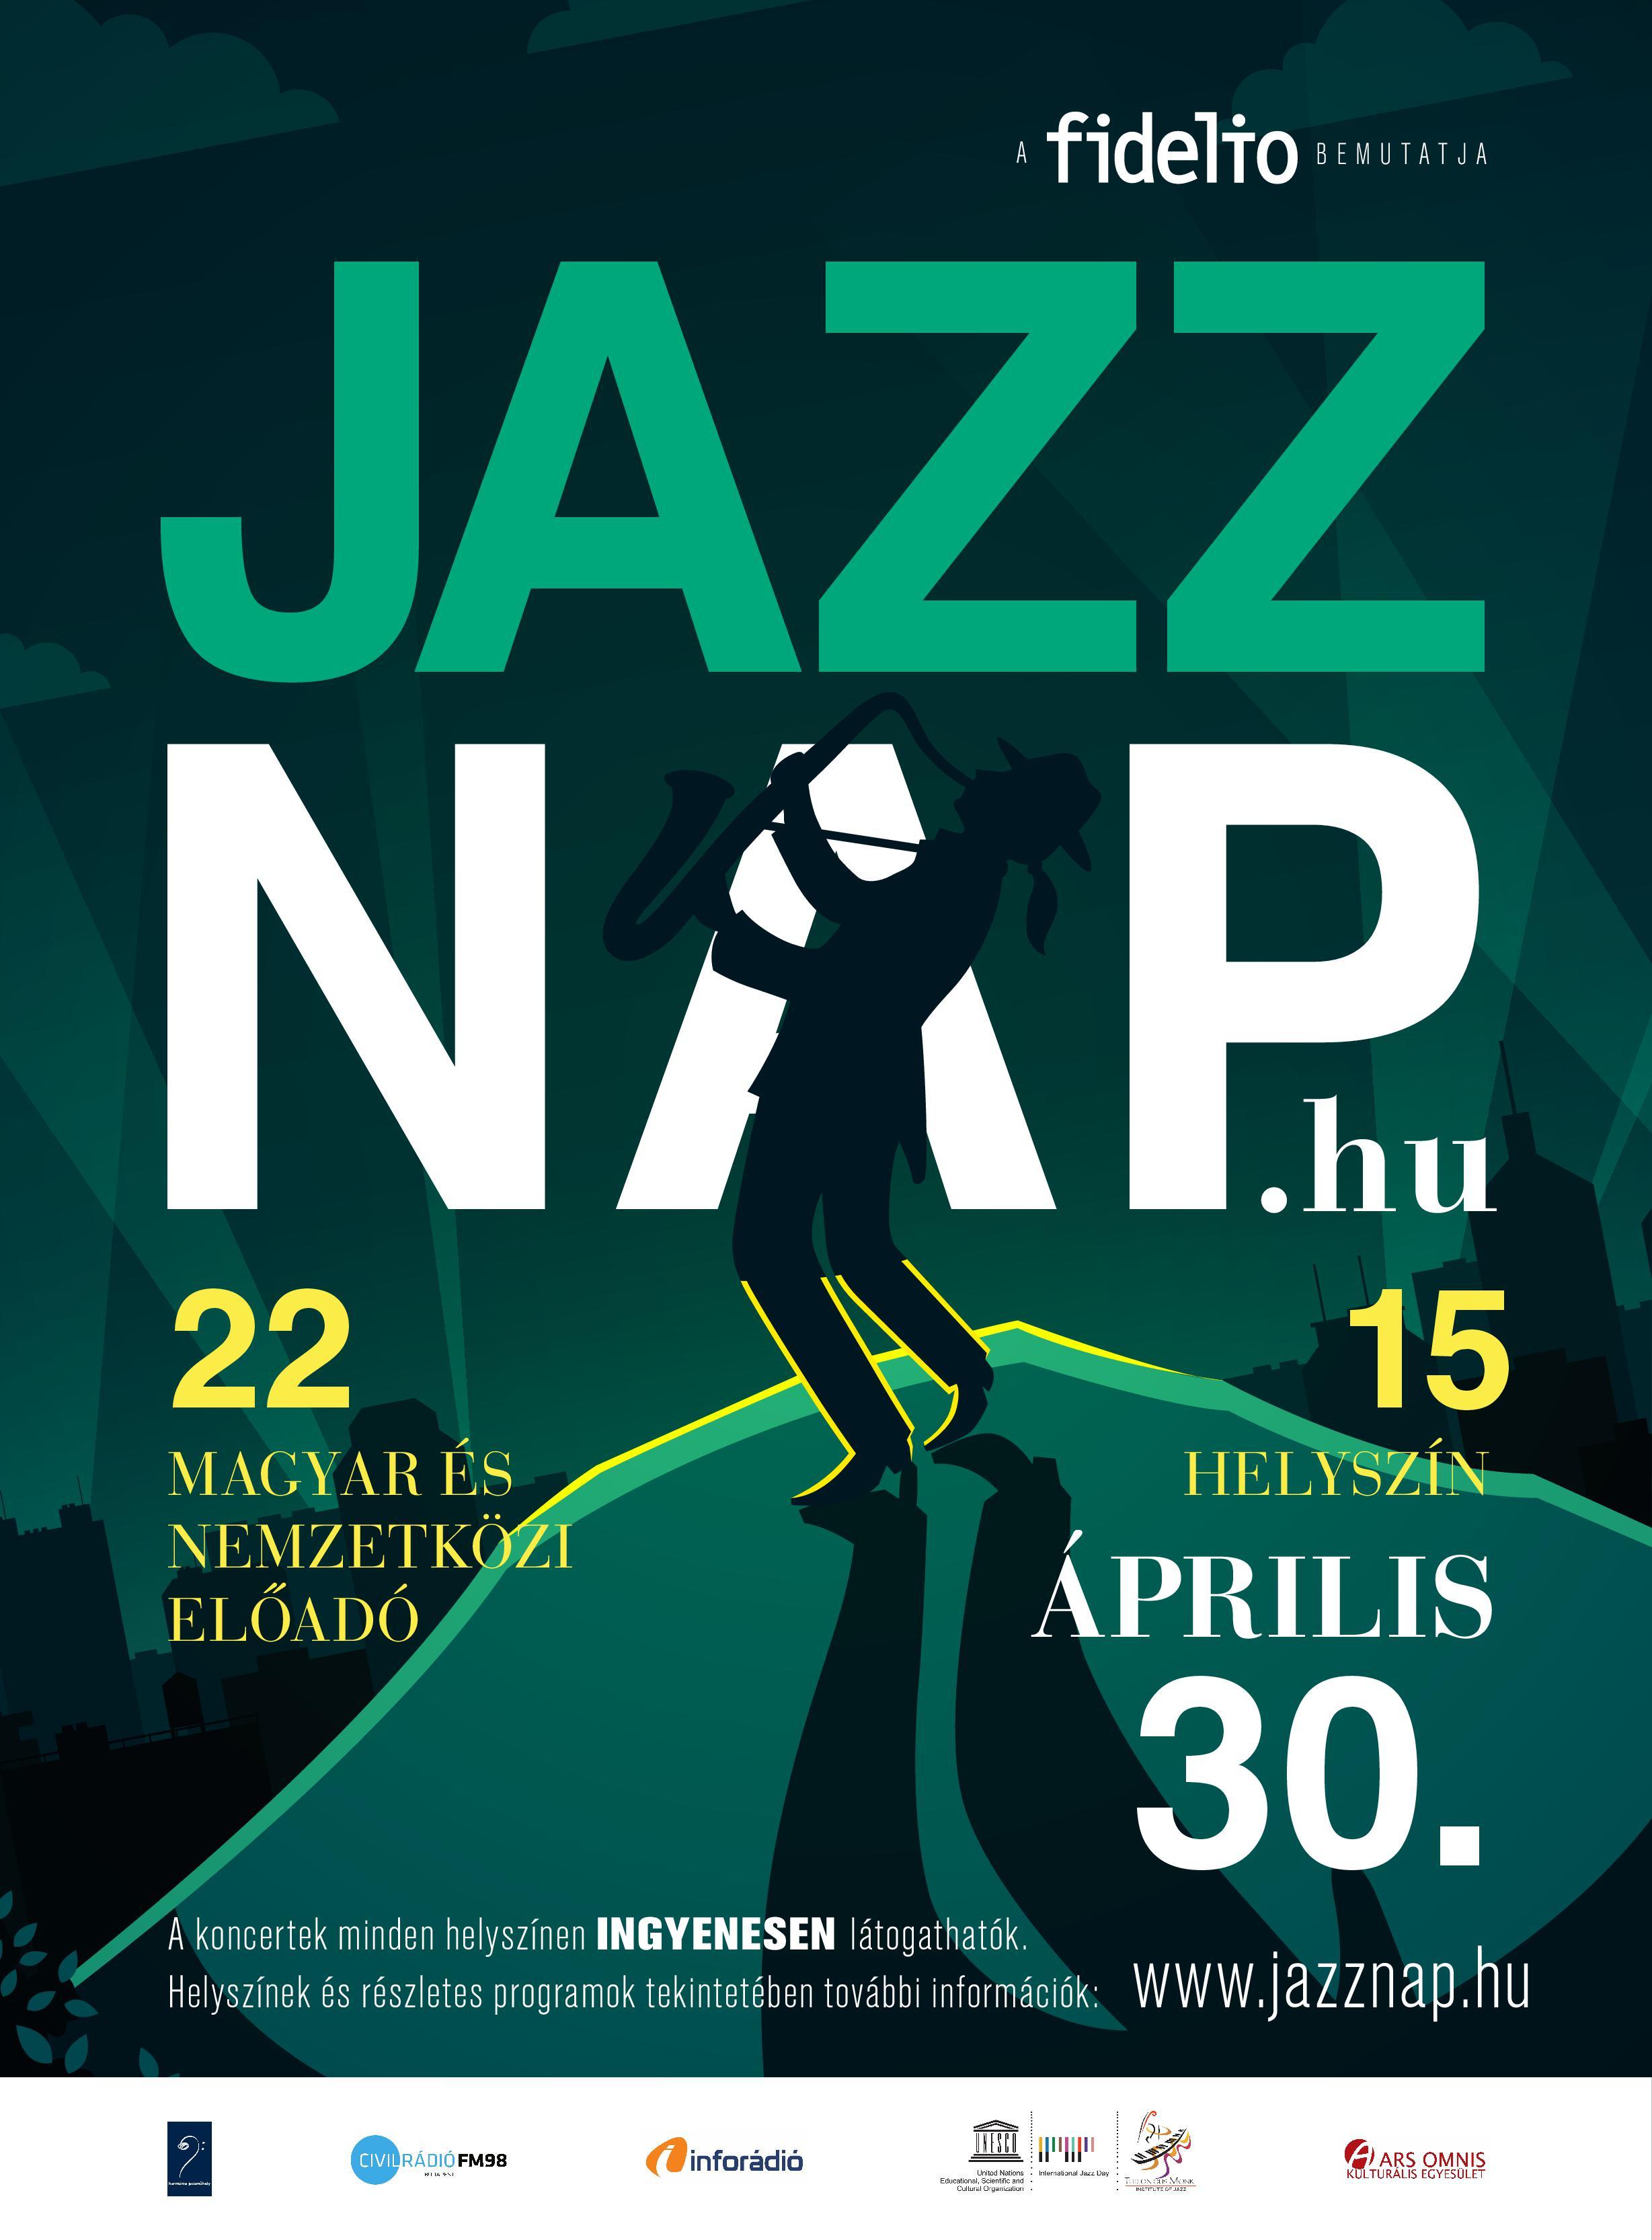 jazznap_hu_krea.jpg